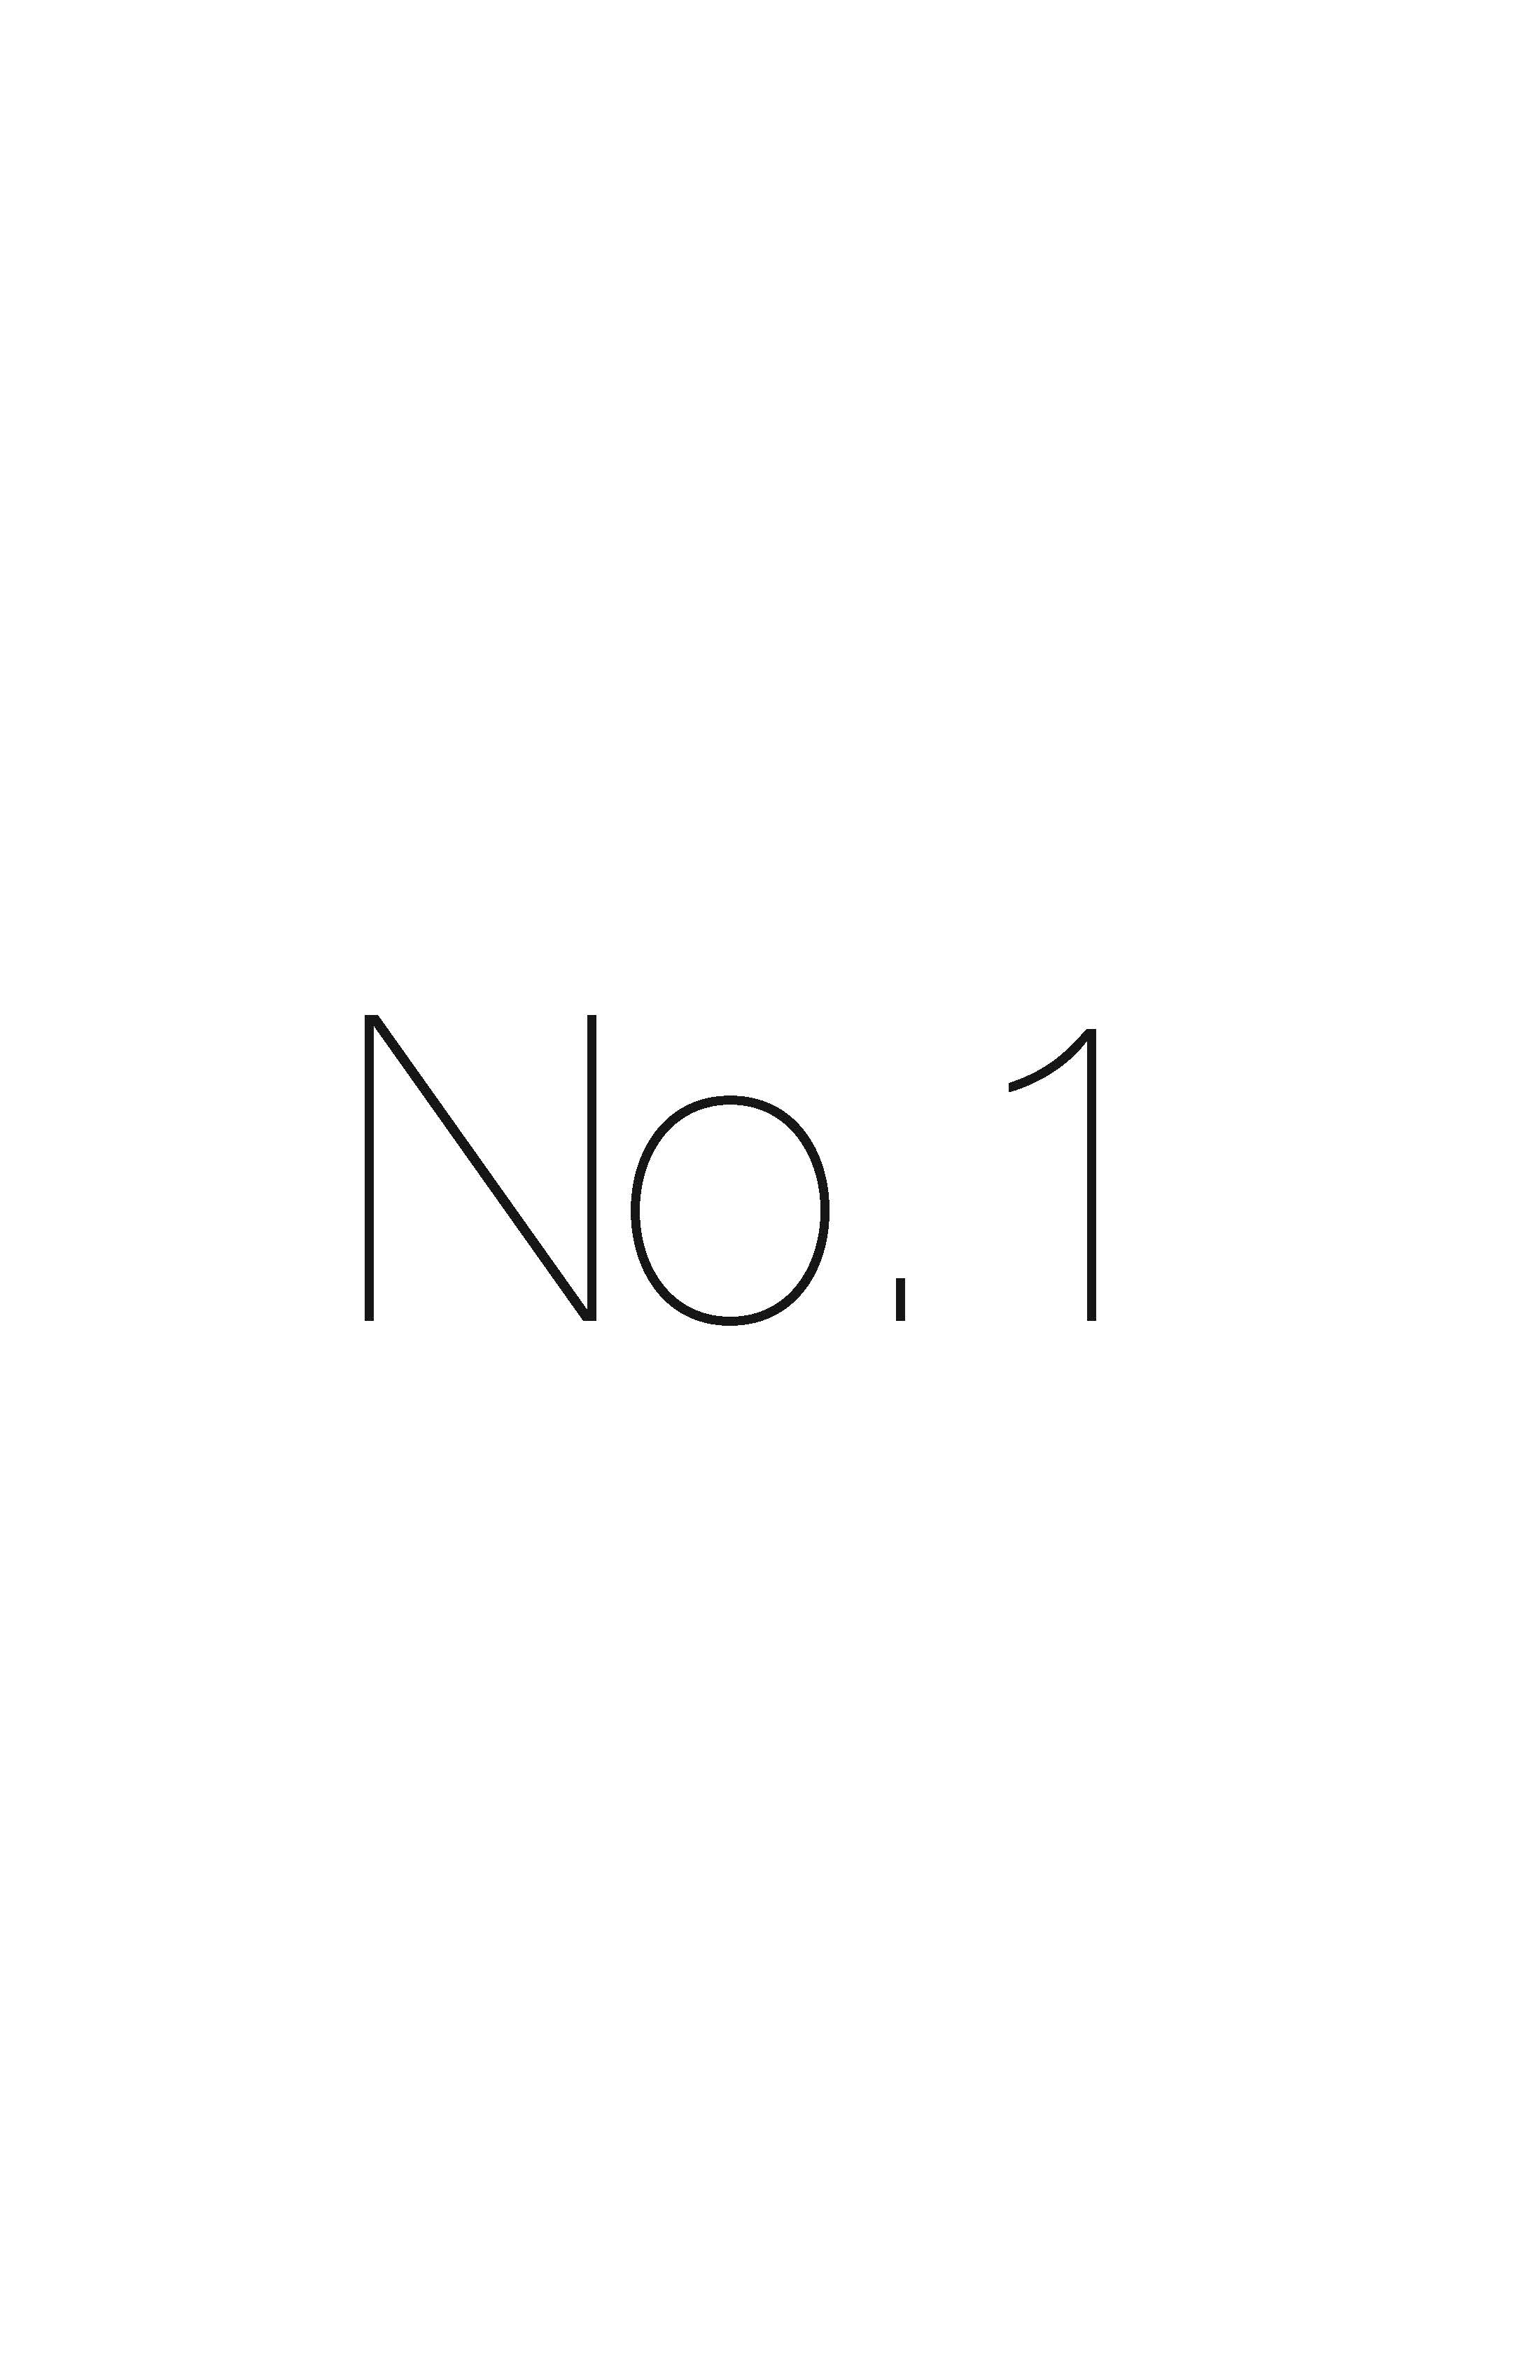 I_Trust_1019_Page_04.jpg